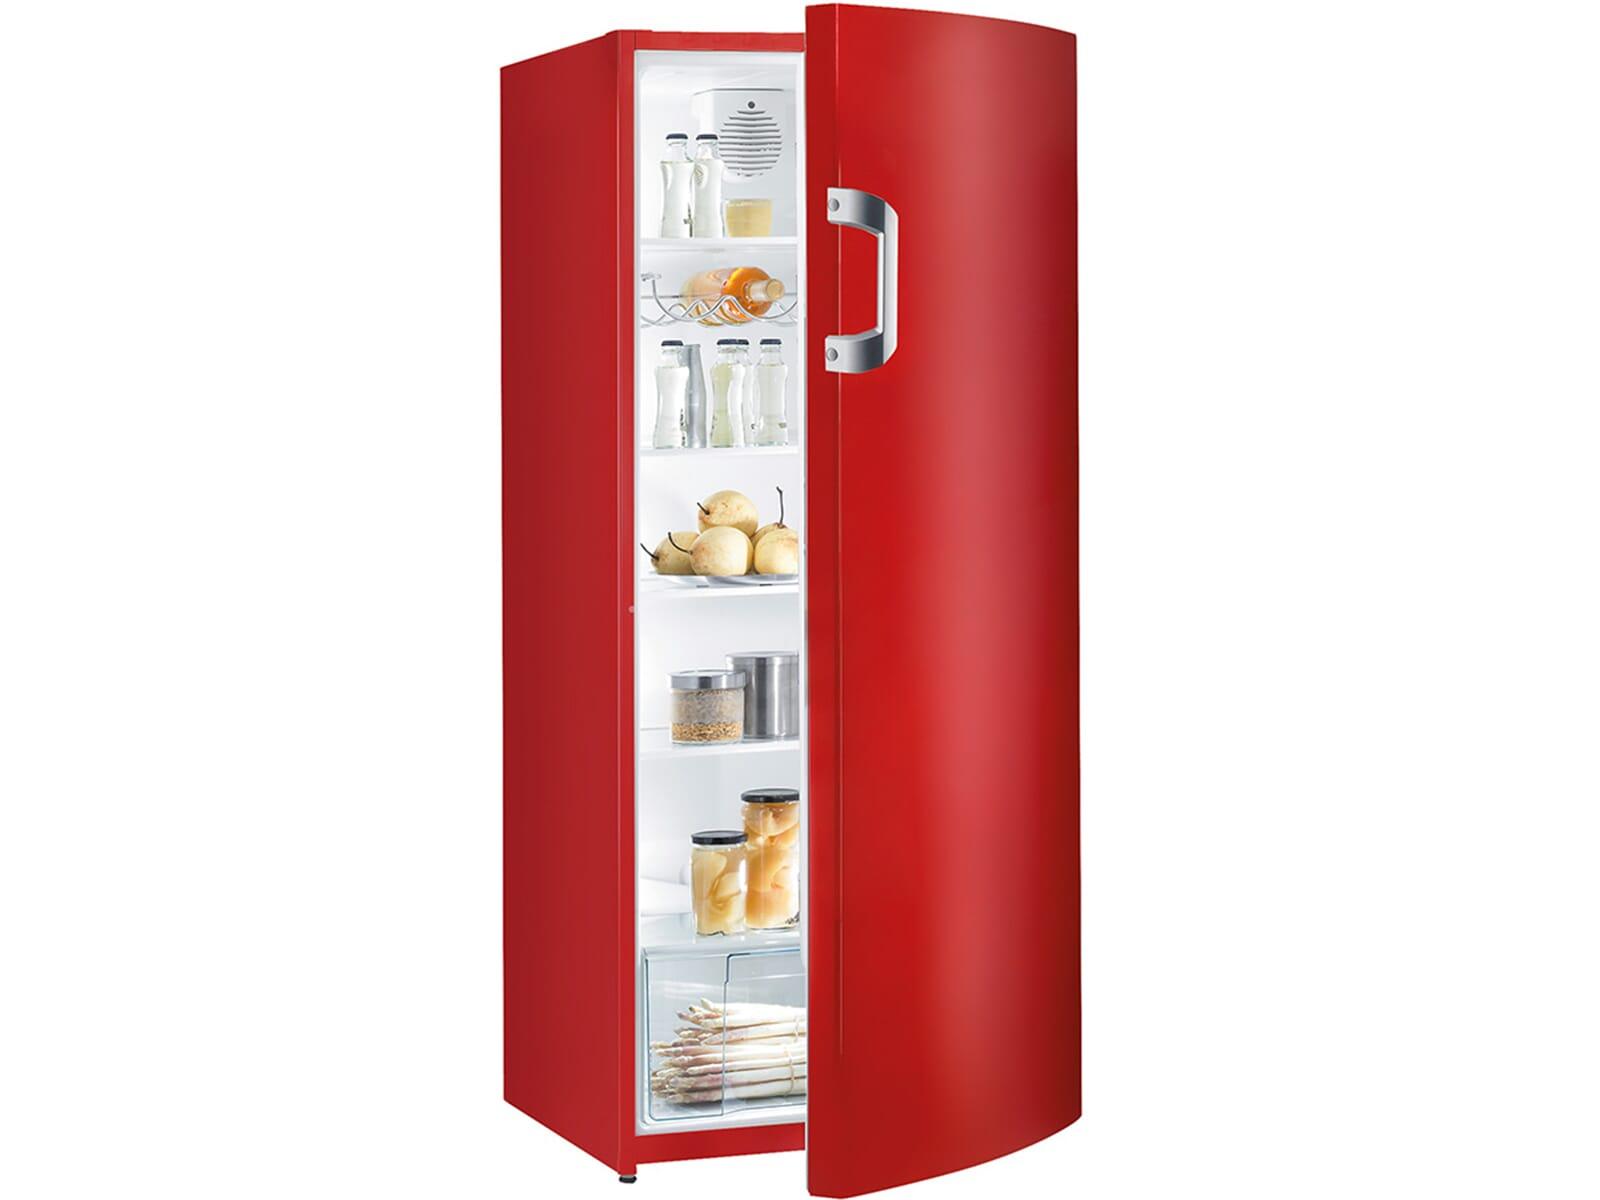 Red Bull Mini Kühlschrank Bedienungsanleitung : Mini kühlschrank aldi dion debra